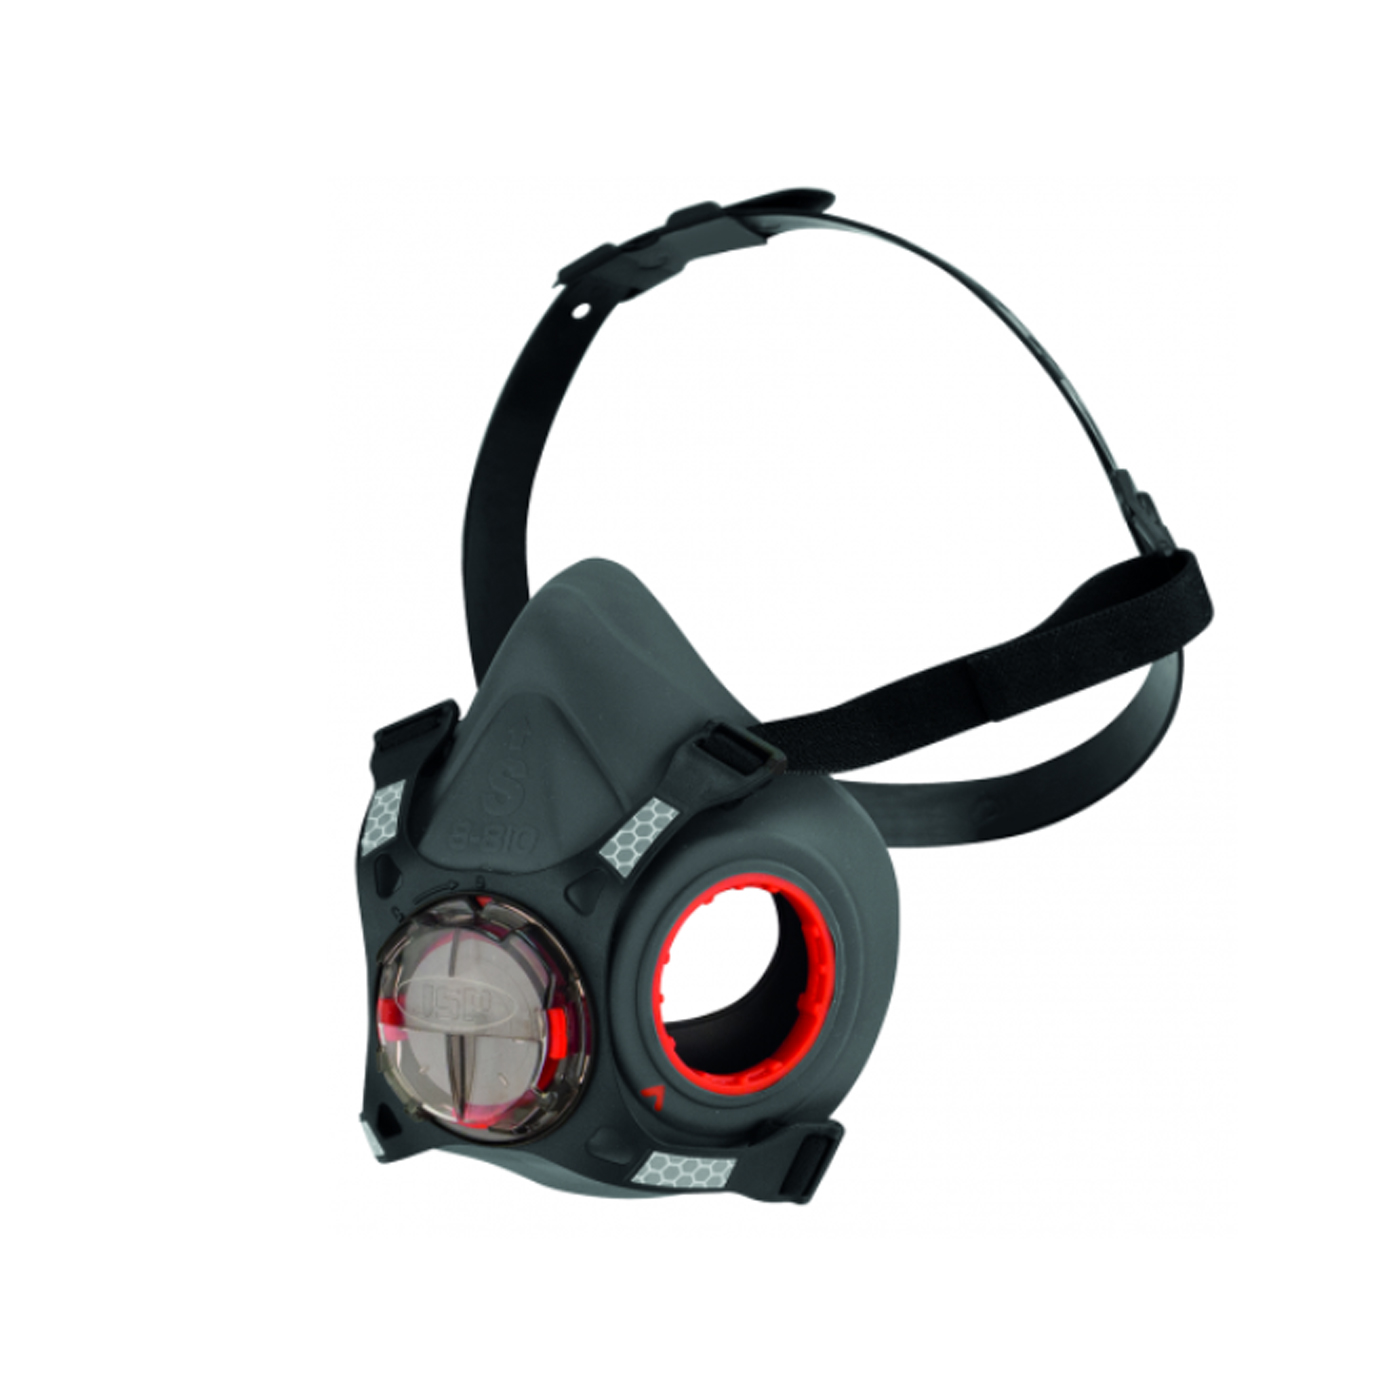 Półmaska ochronna JSP Force 8 BHG003-2L5-000 – rozmiar L (bez filtrów)